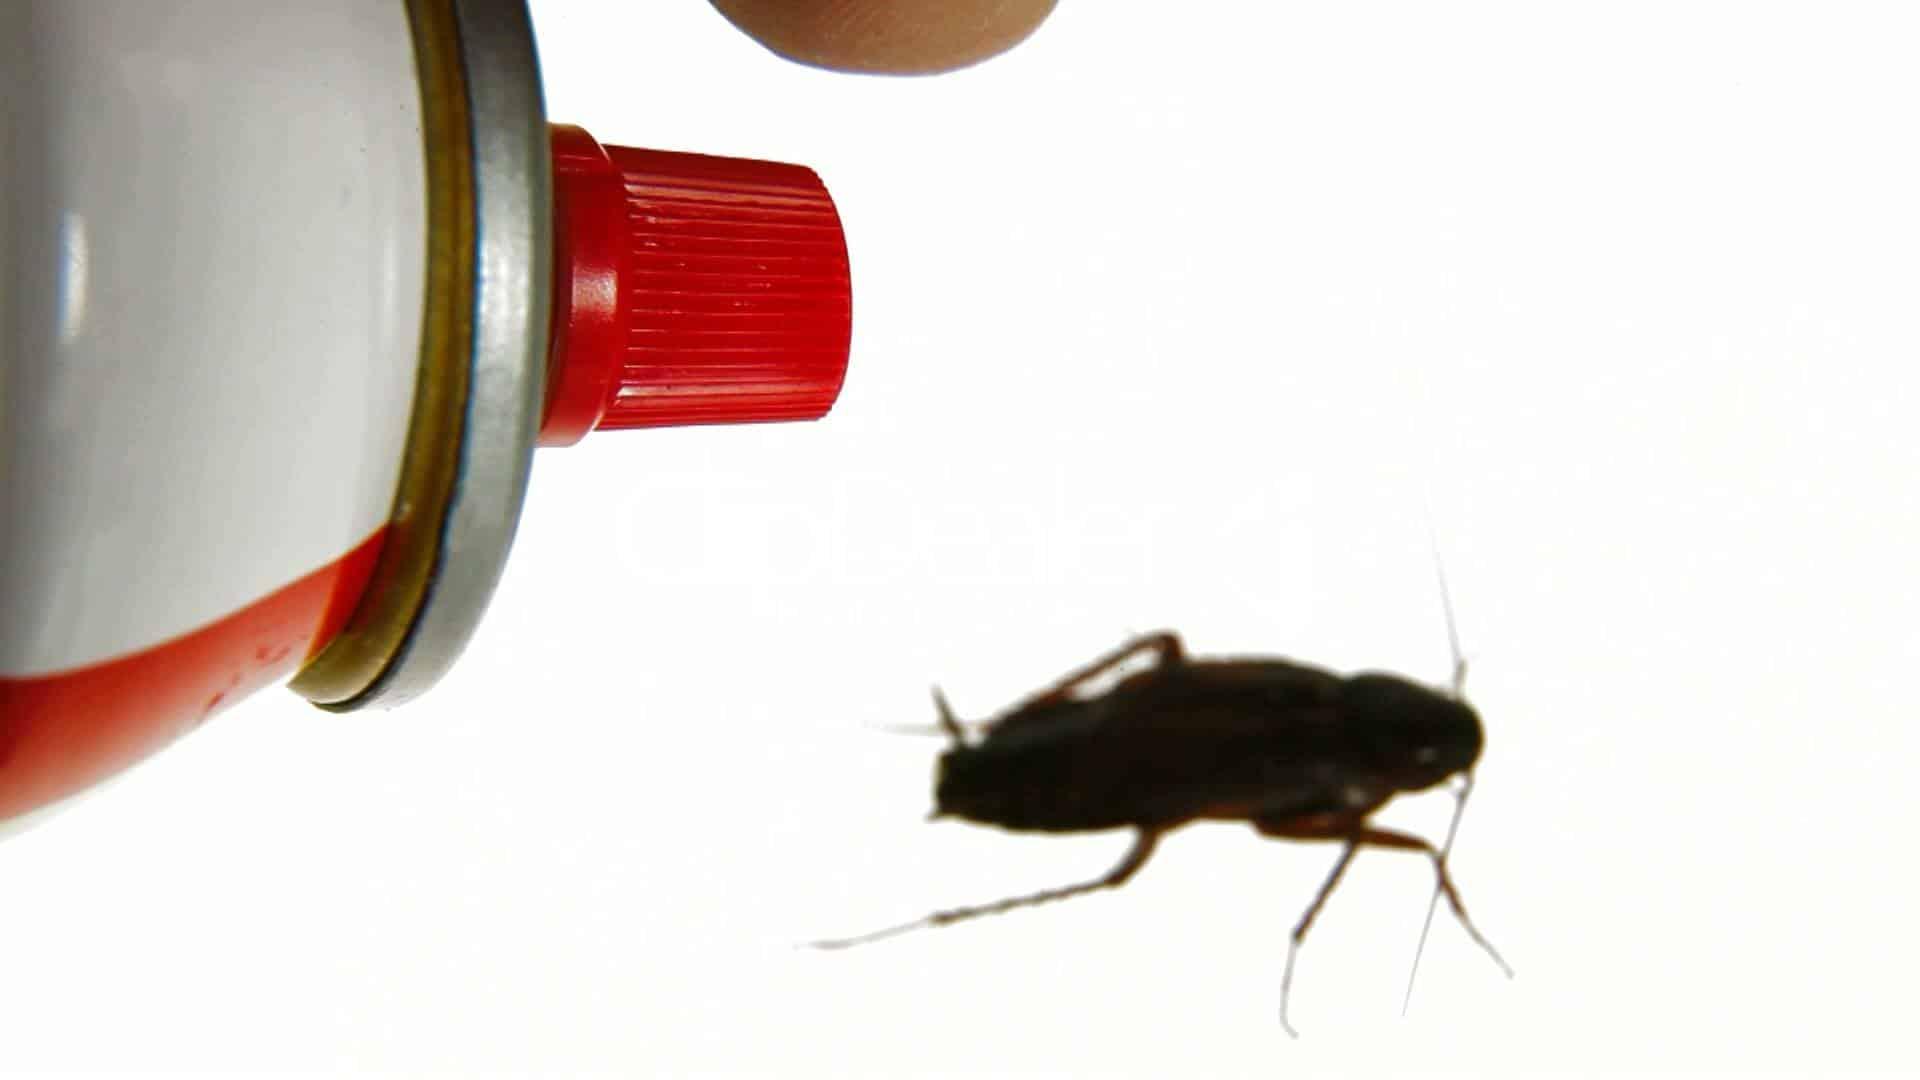 Roach Killer Spray